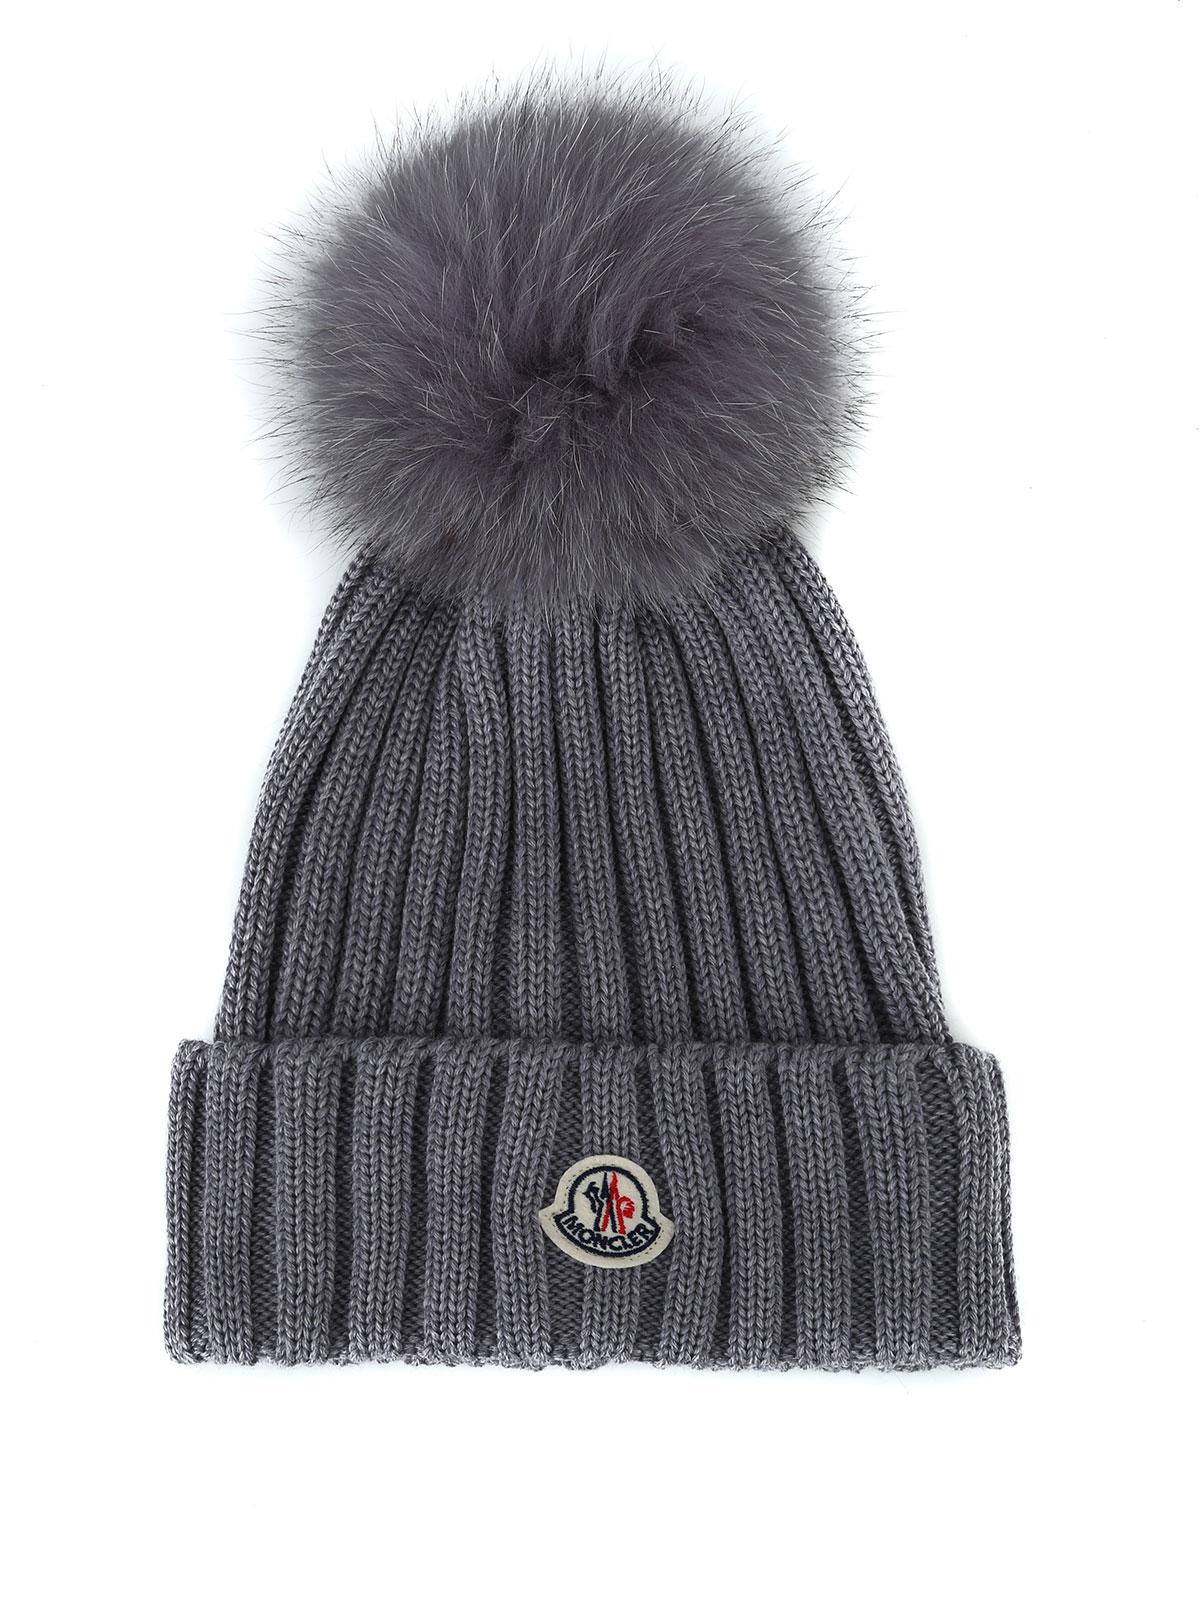 Moncler - Fur pompom grey ribbed wool beanie - beanies - D2 093 ... f284d8e9f9c